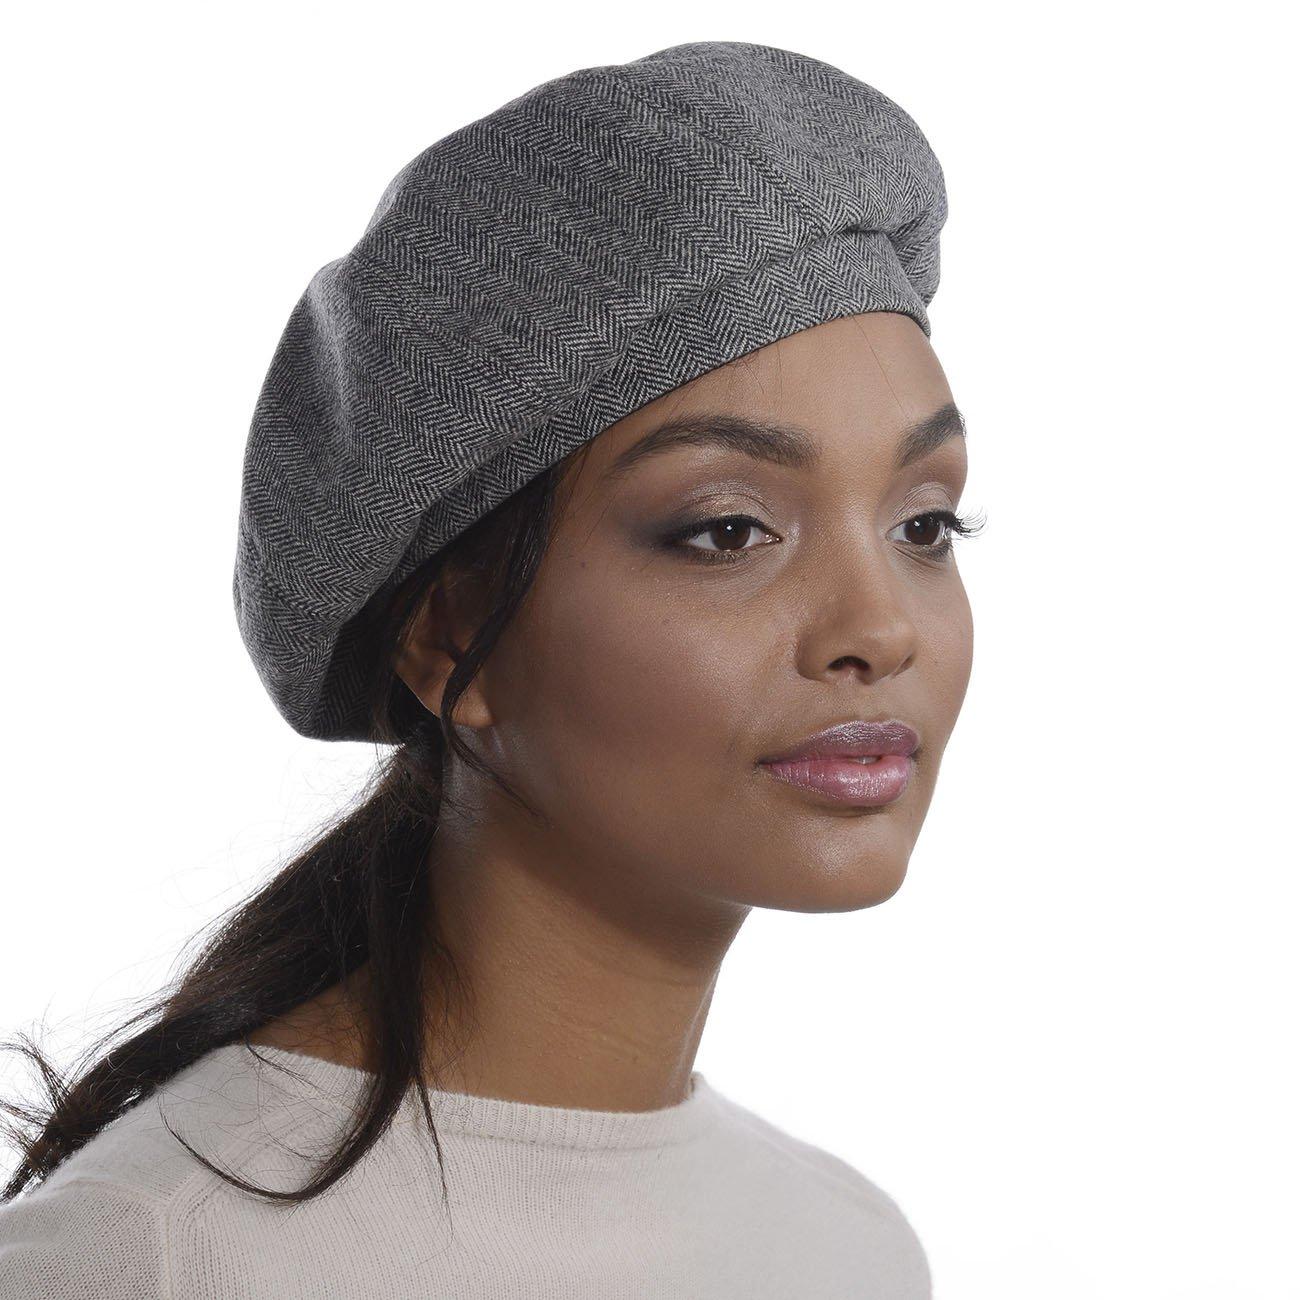 Eric Javits Designer Women's Luxury Headwear - Tweed Beret - Blue Mix